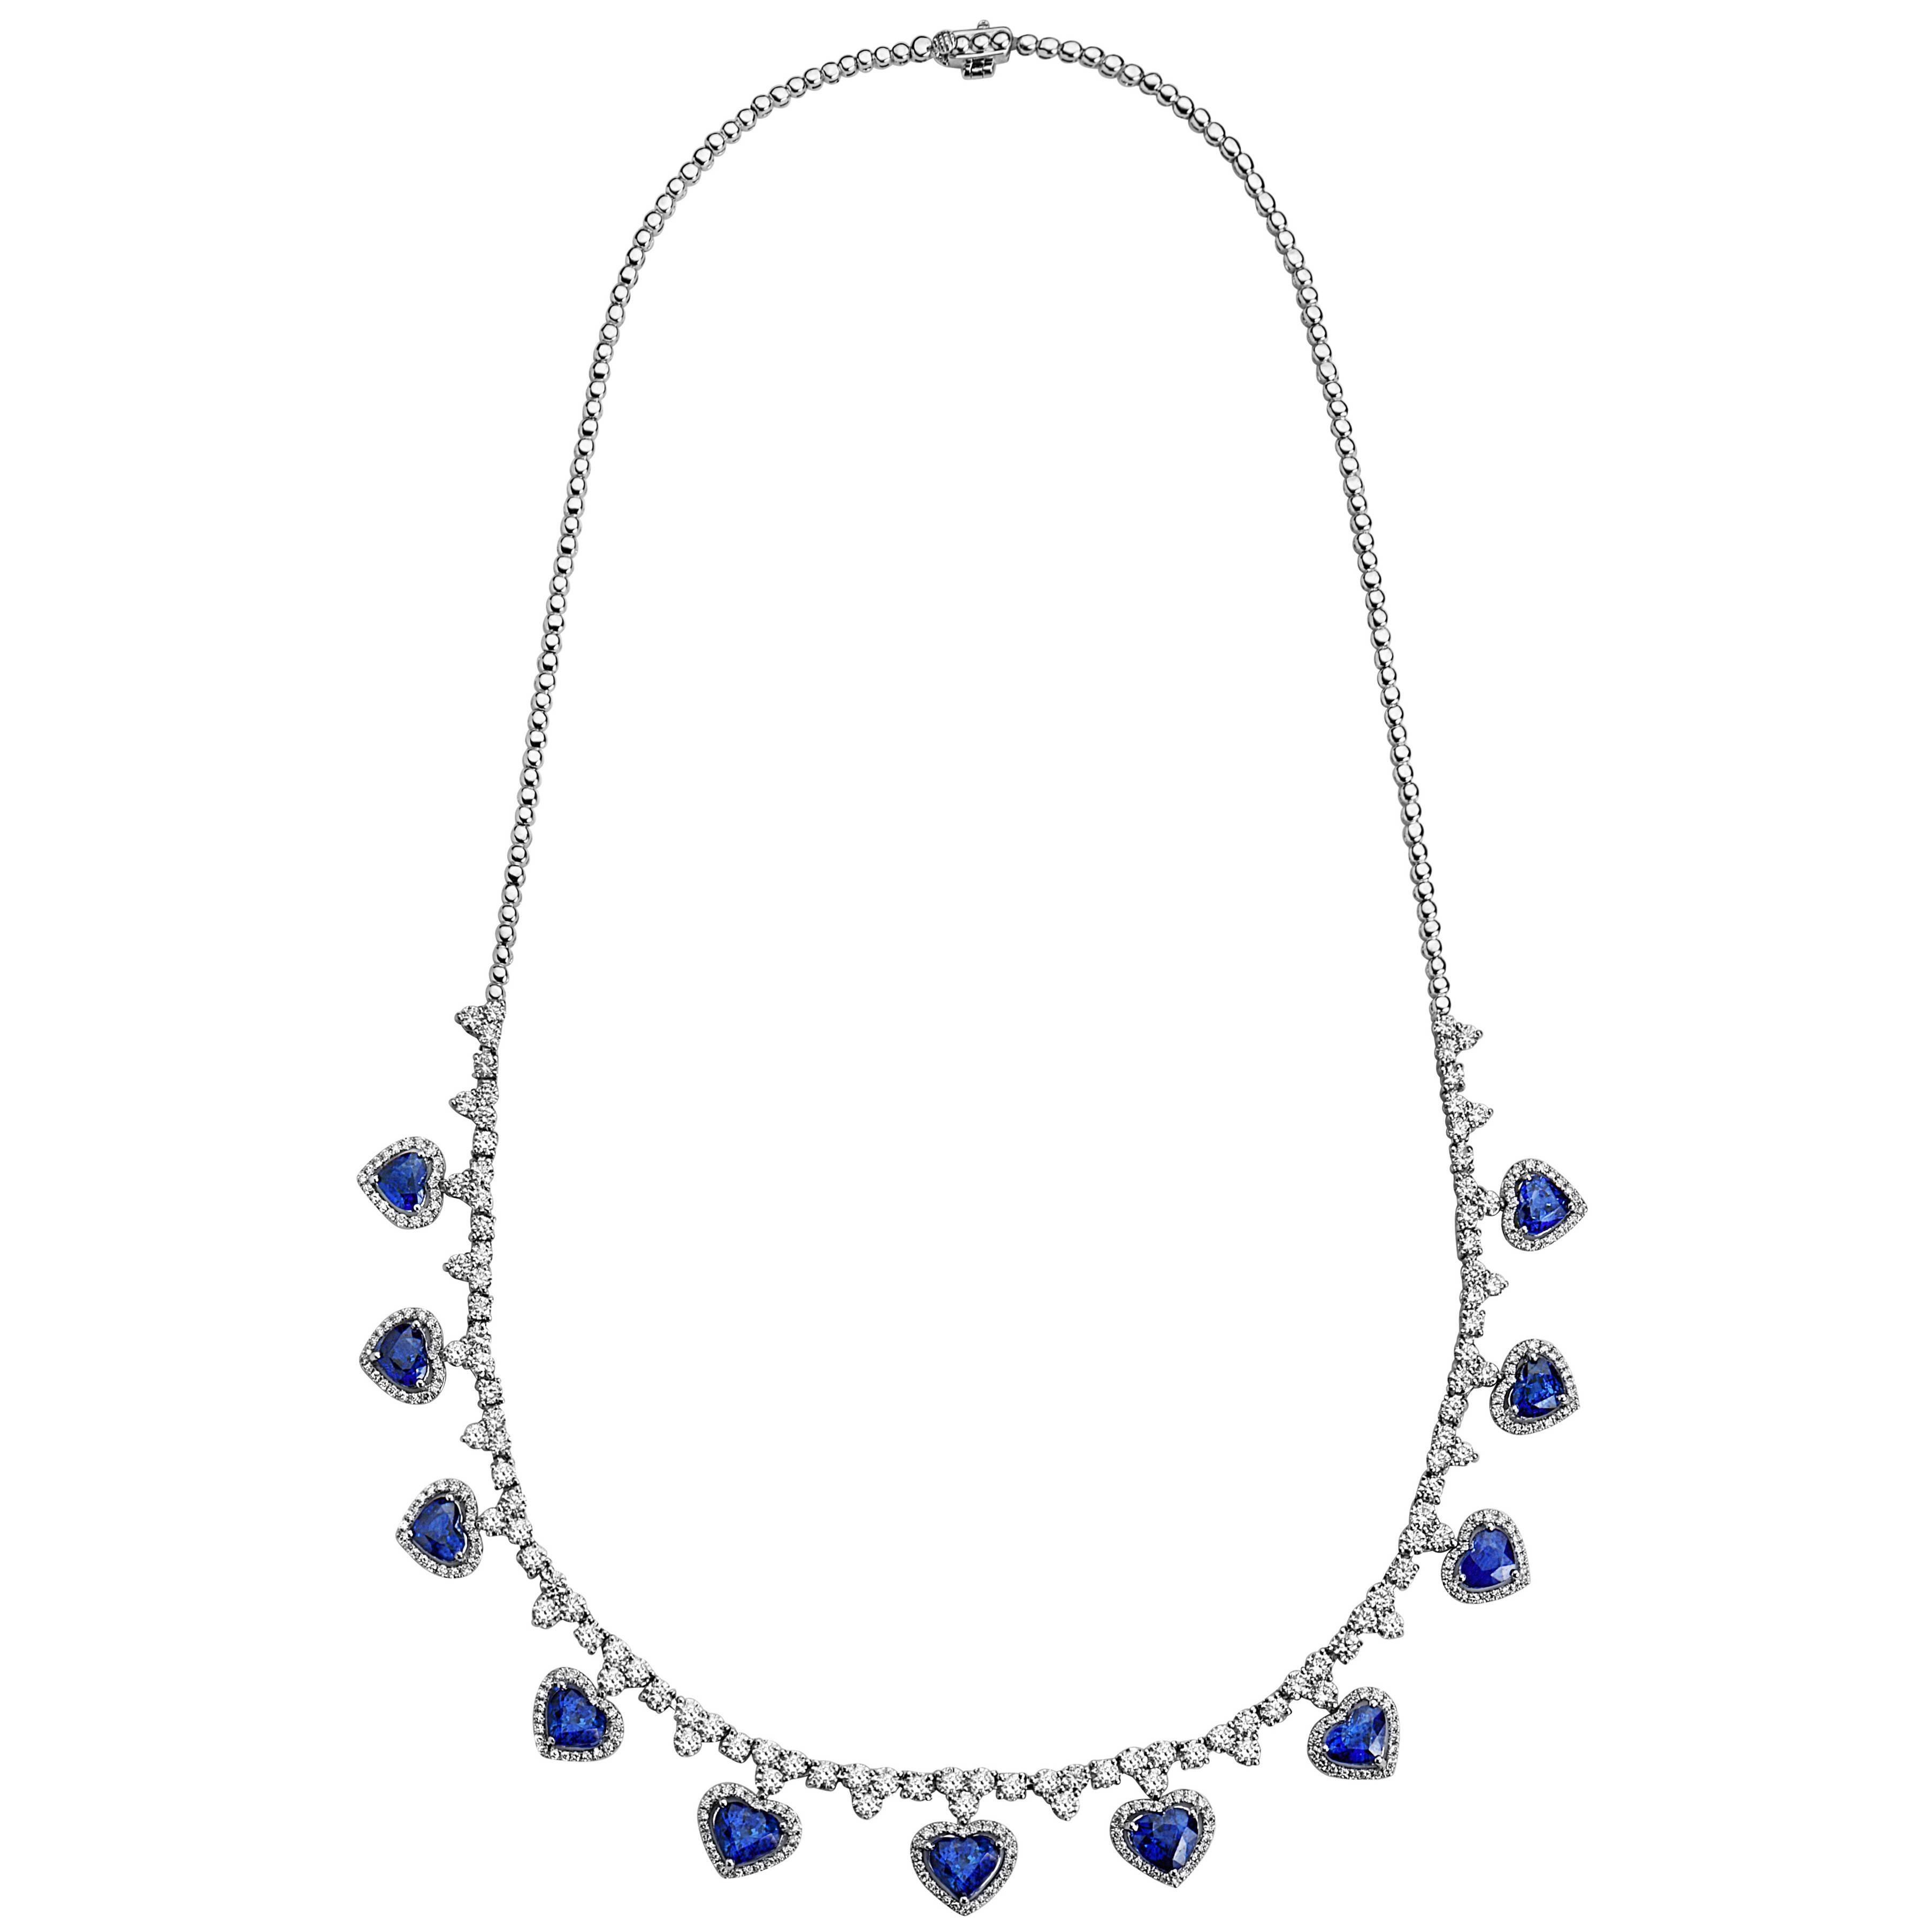 Emilio Jewelry 18.96 Carat Heart Shaped Sapphire Diamond Necklace